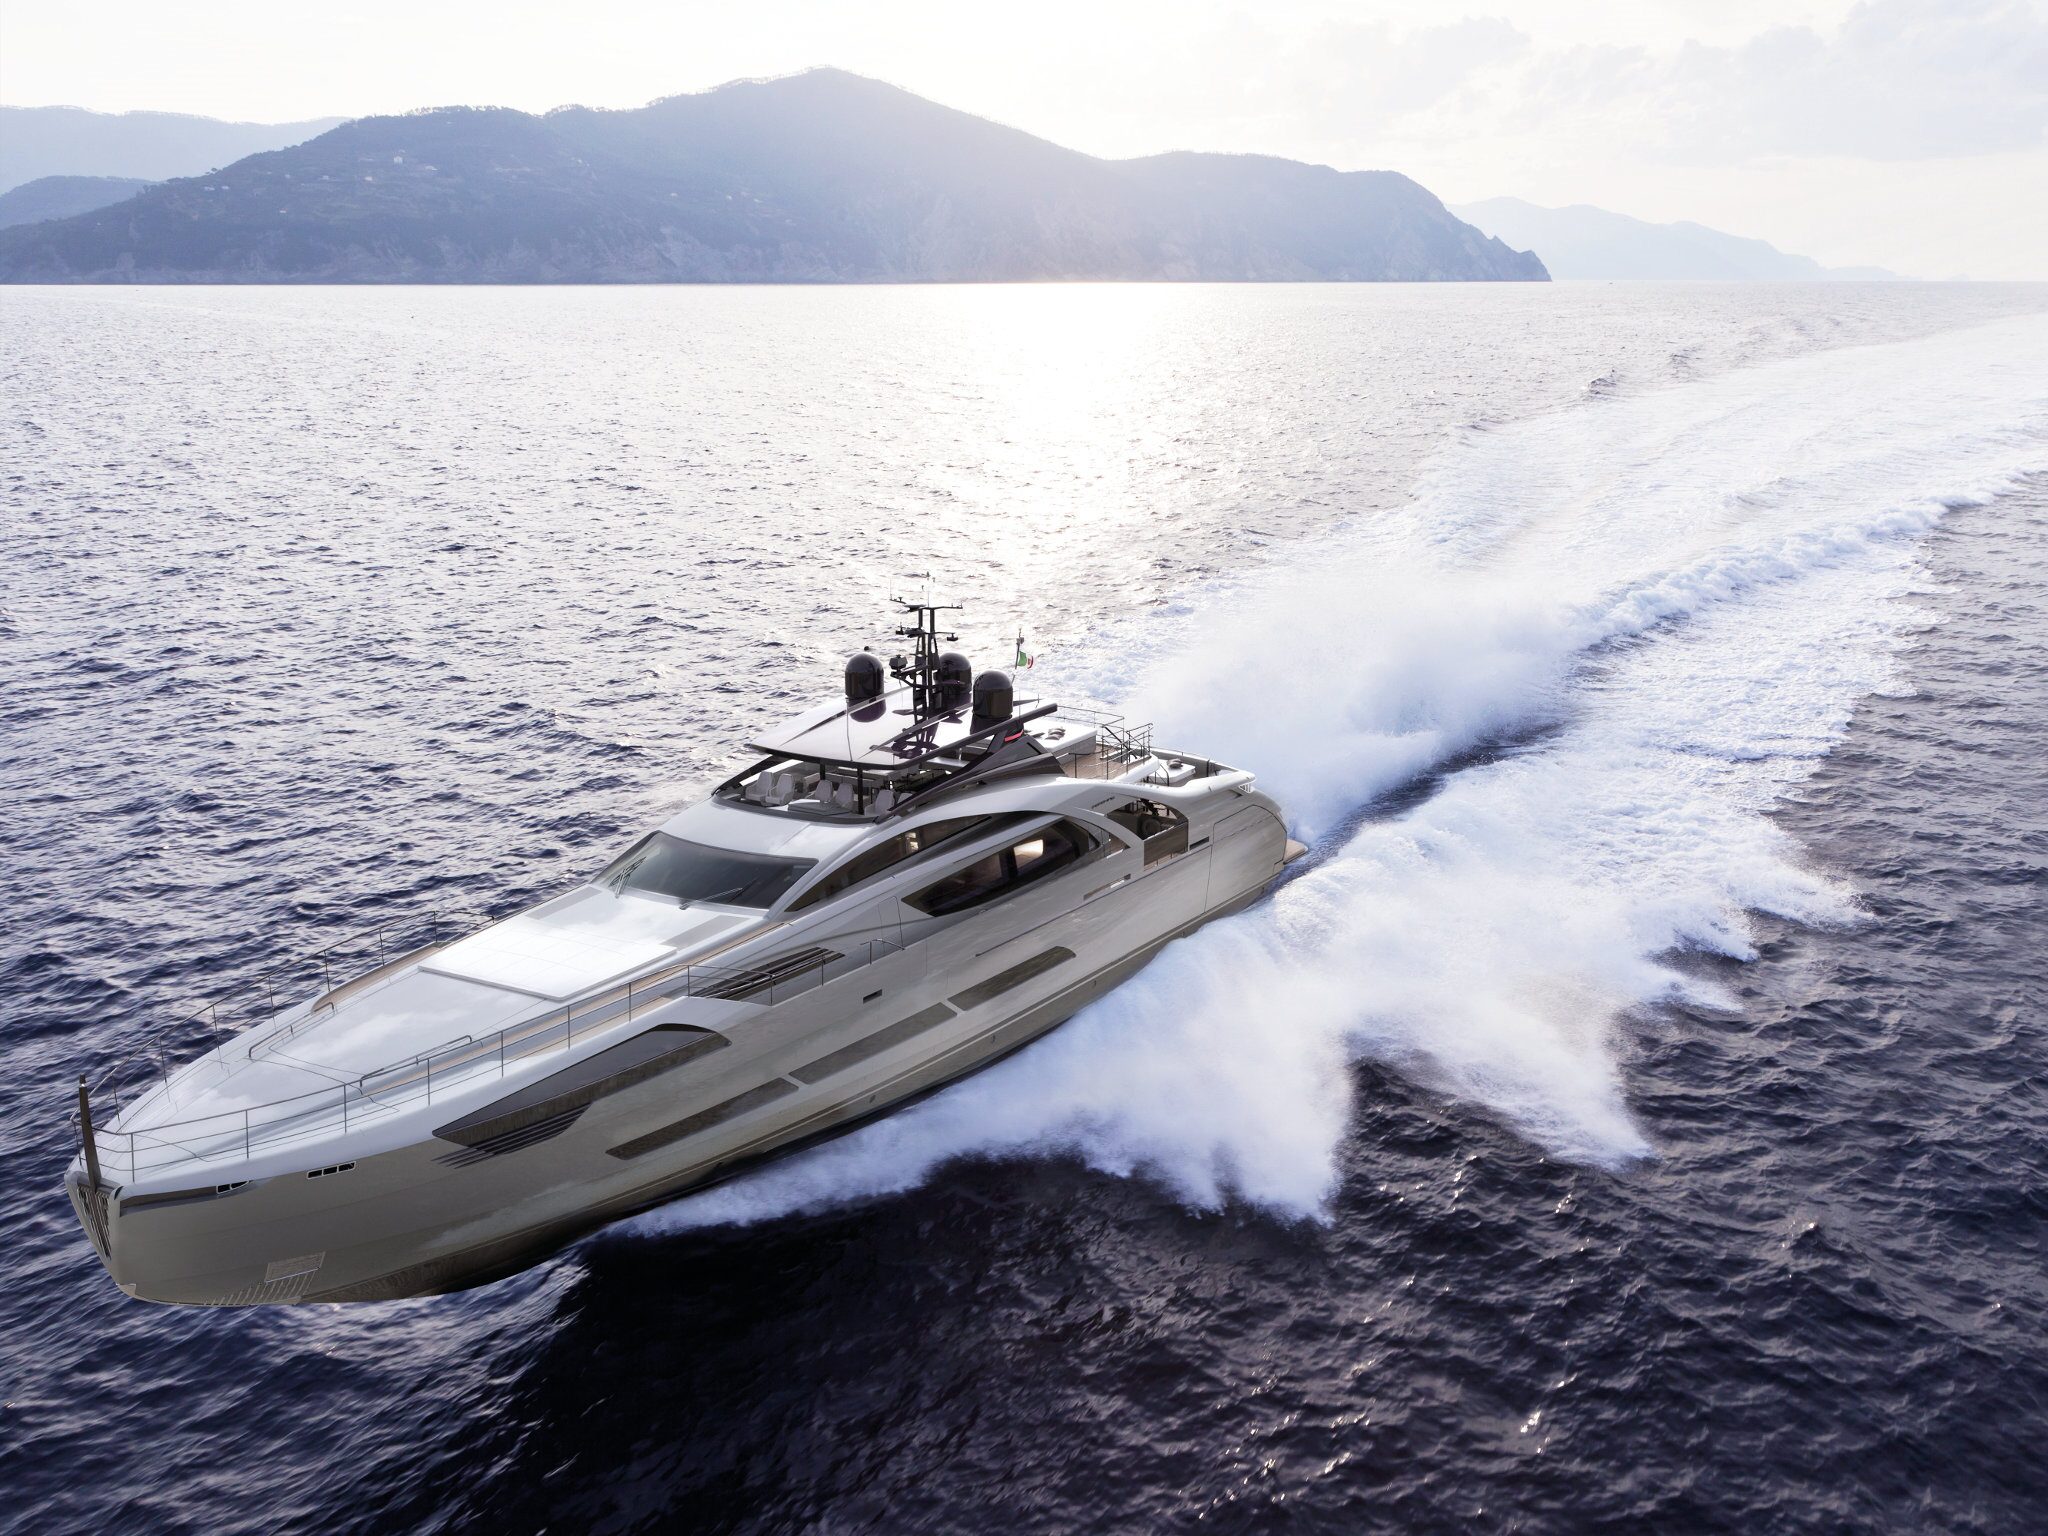 ferretti yachts ferretti group pershing yachts pershing 140 JMA Yachting Port Fréjus Var vente location neuf occasion places de